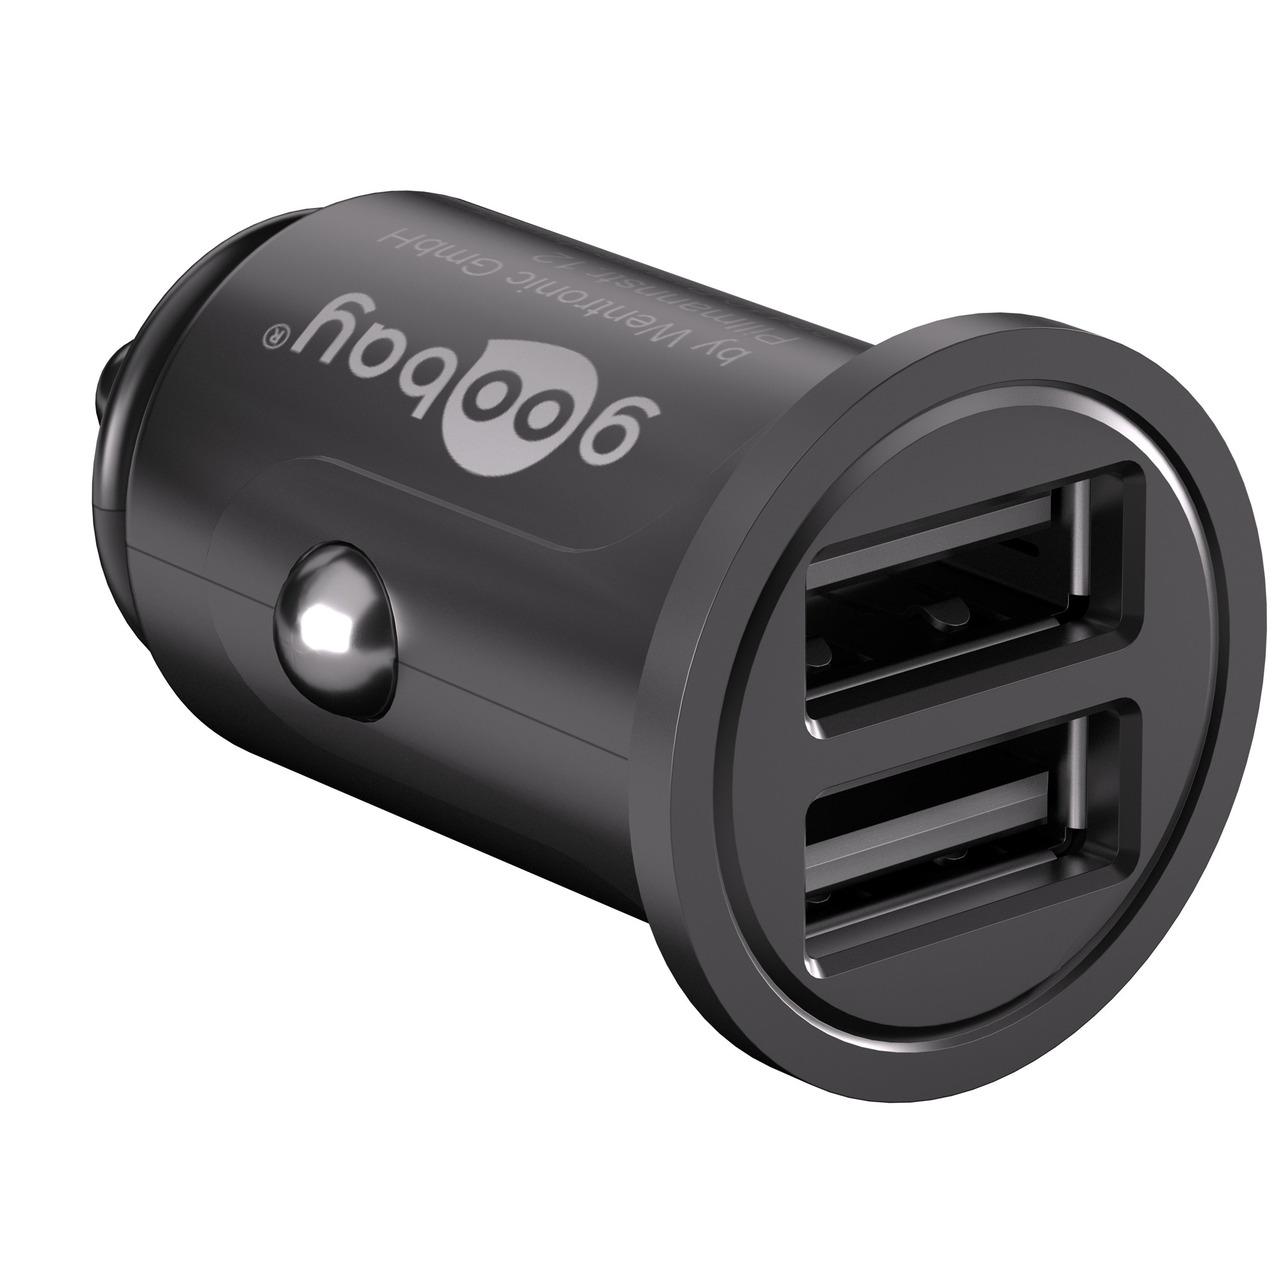 Goobay USB-Autoladegerund-228 t 4-8 A- 2 x USB 2-0-Buchse (Typ A)